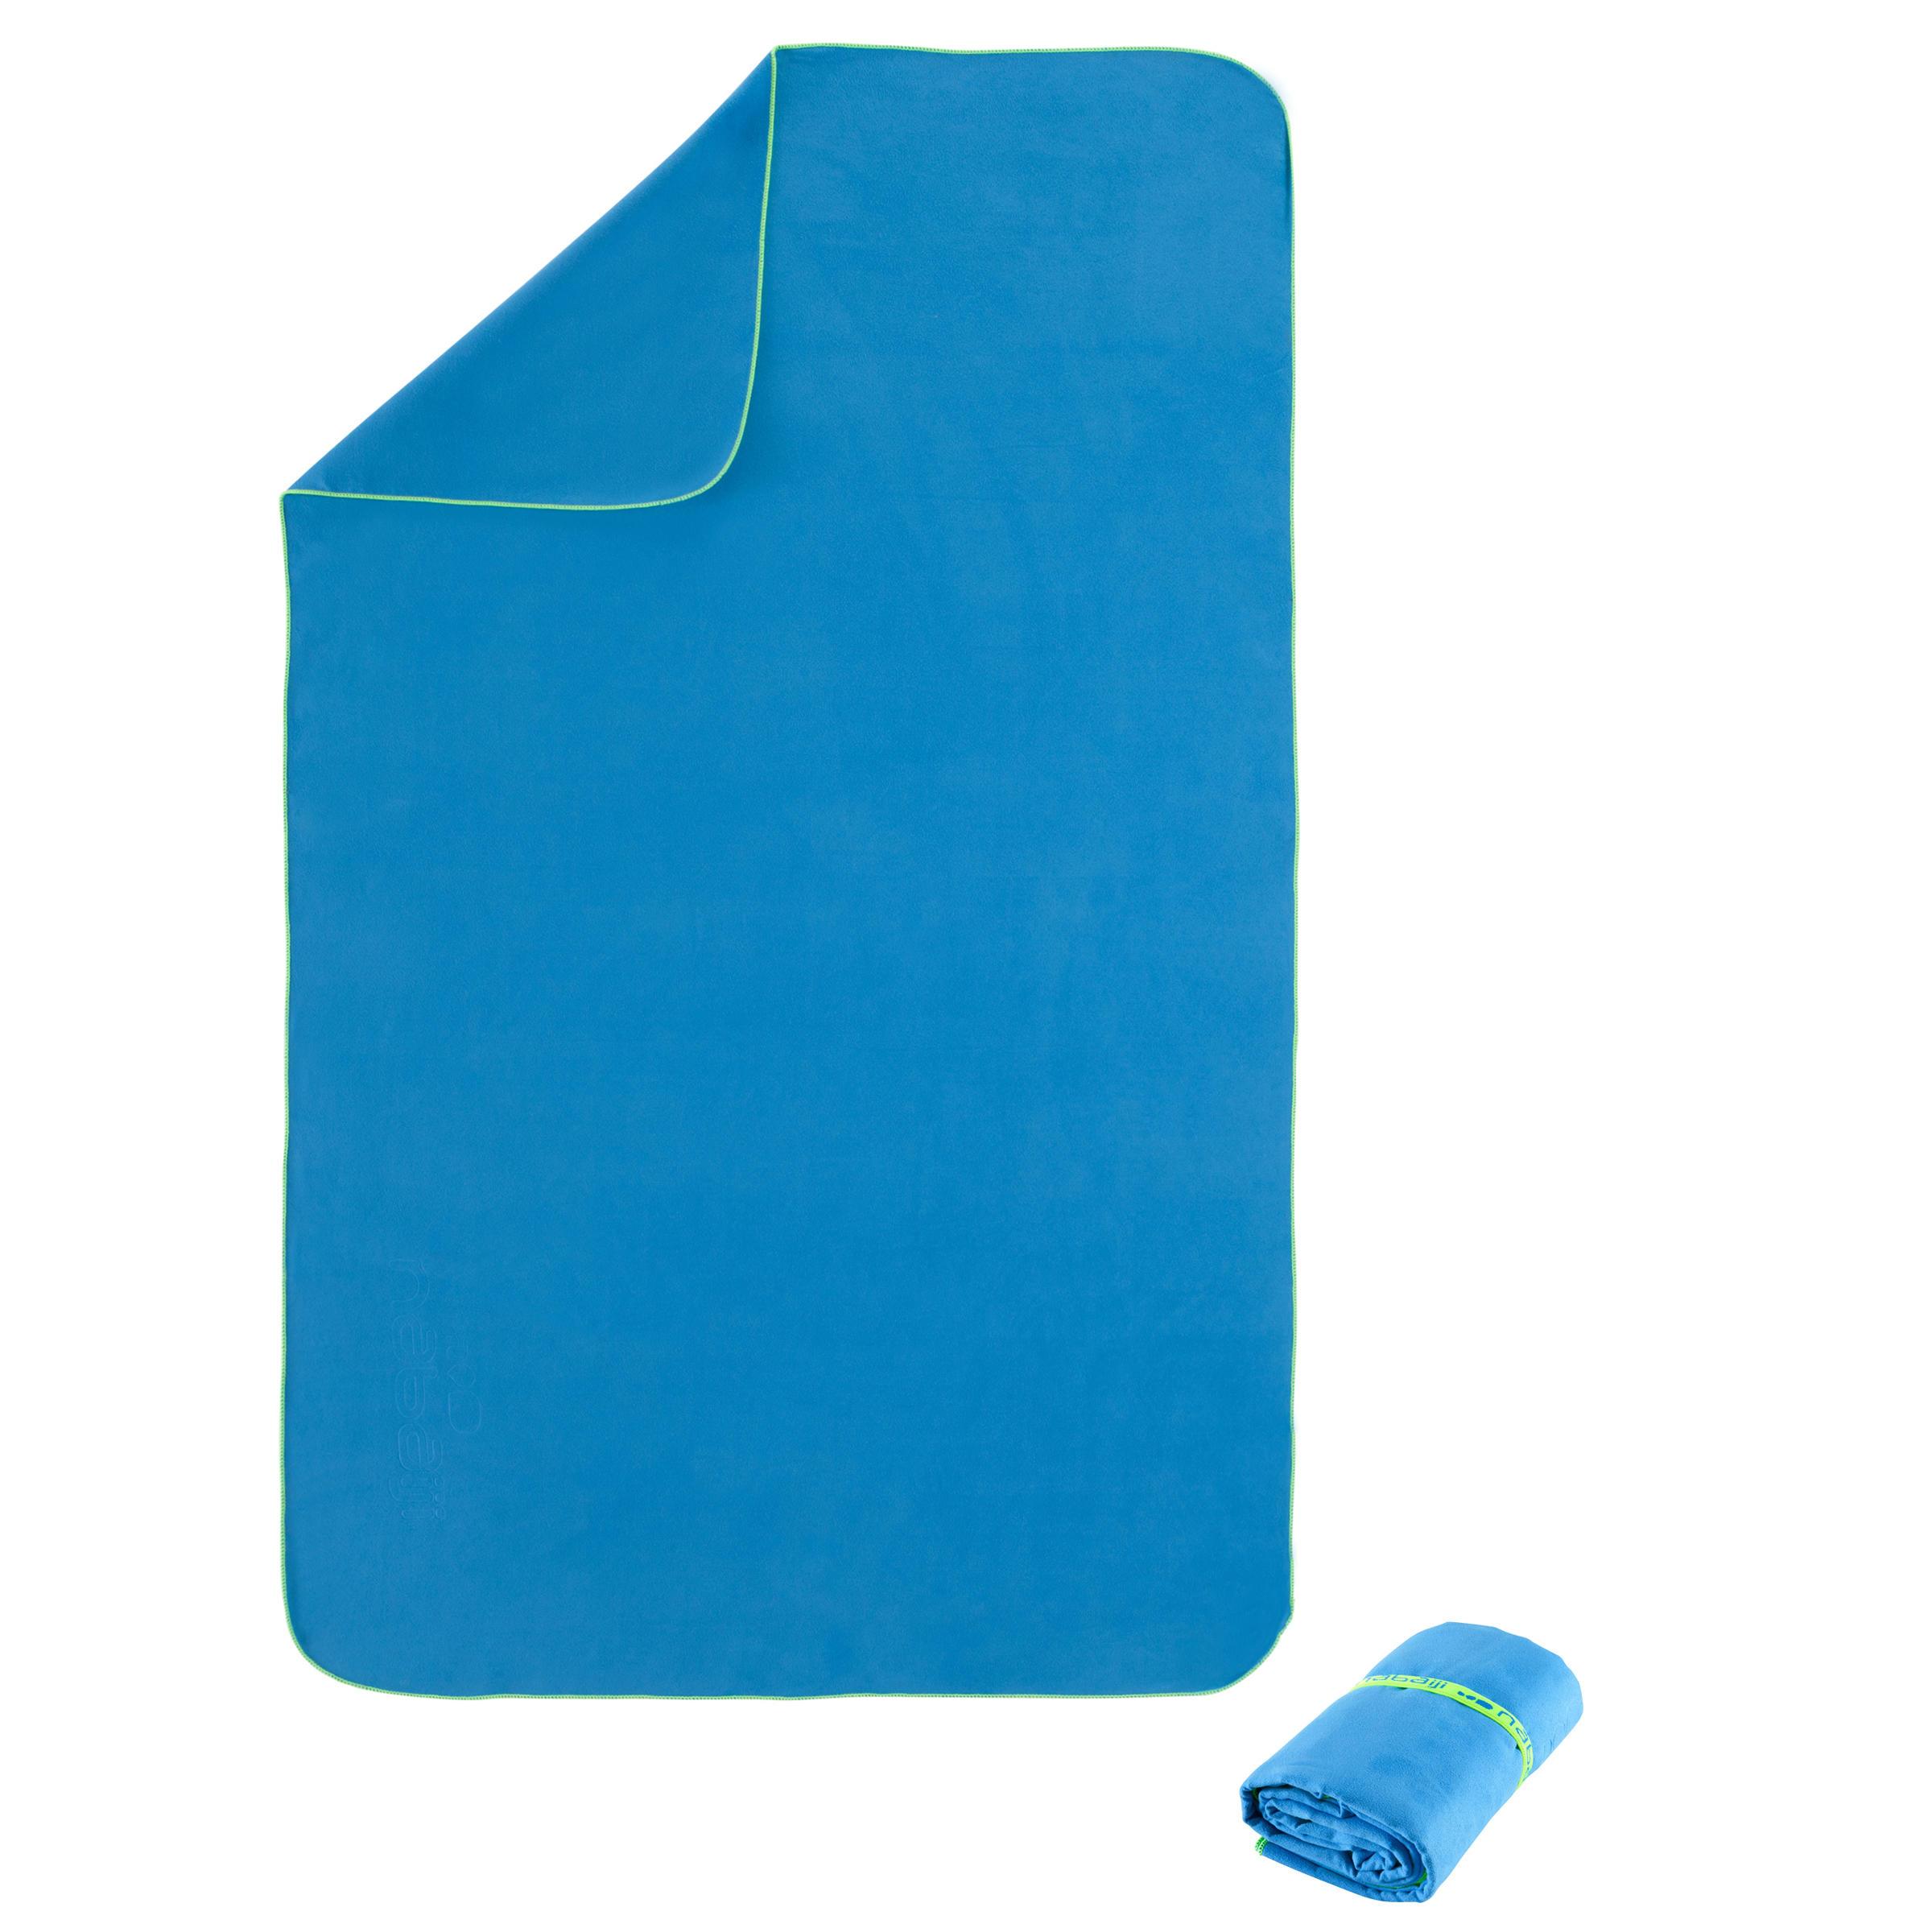 Ultra-Compact Microfibre Towel Size XL 110 x 175 cm - China Blue